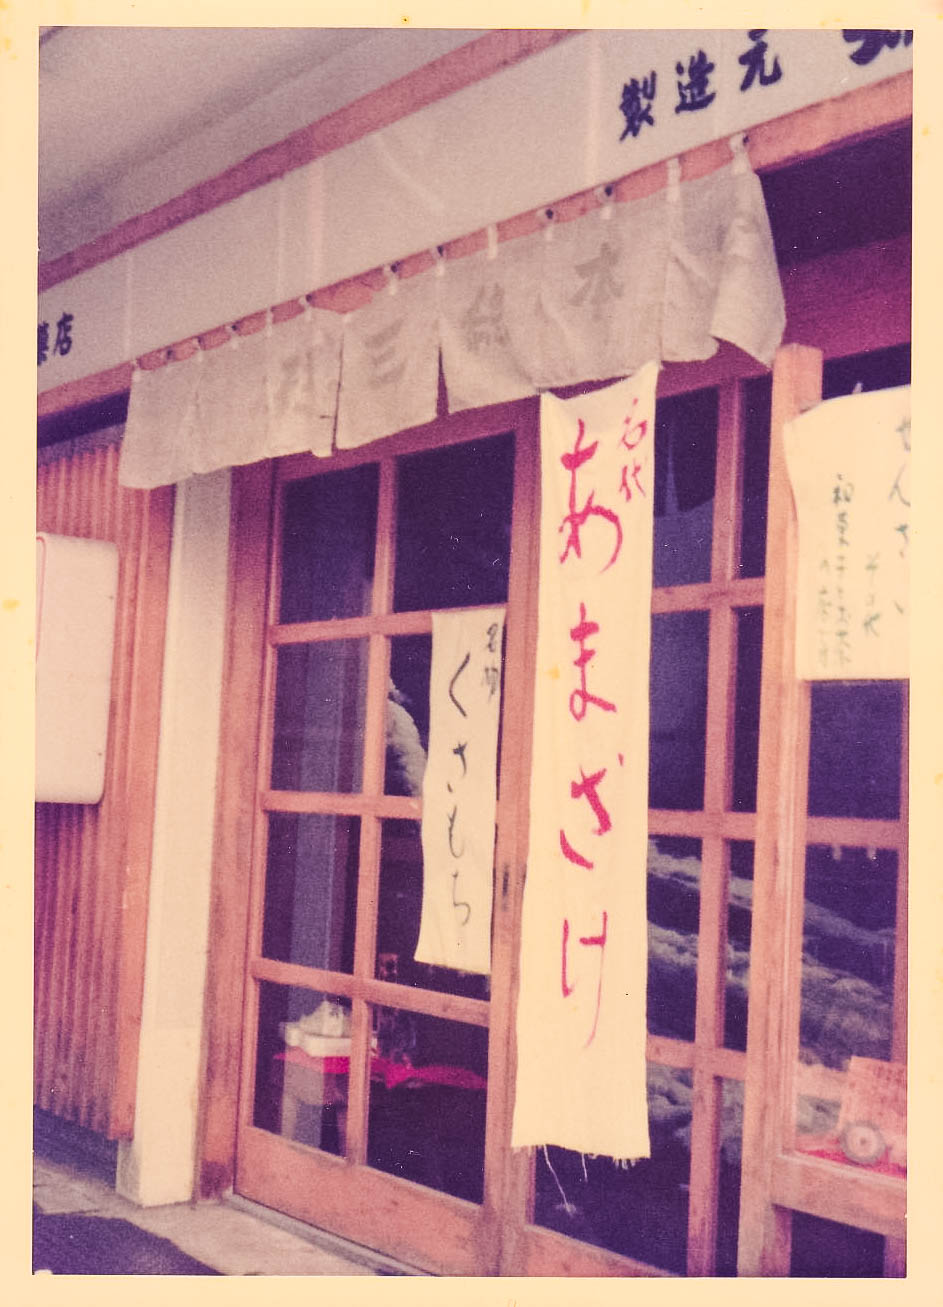 孫三総本家・花詩の歴史(C)孫三総本家・花詩Hakone Sweets